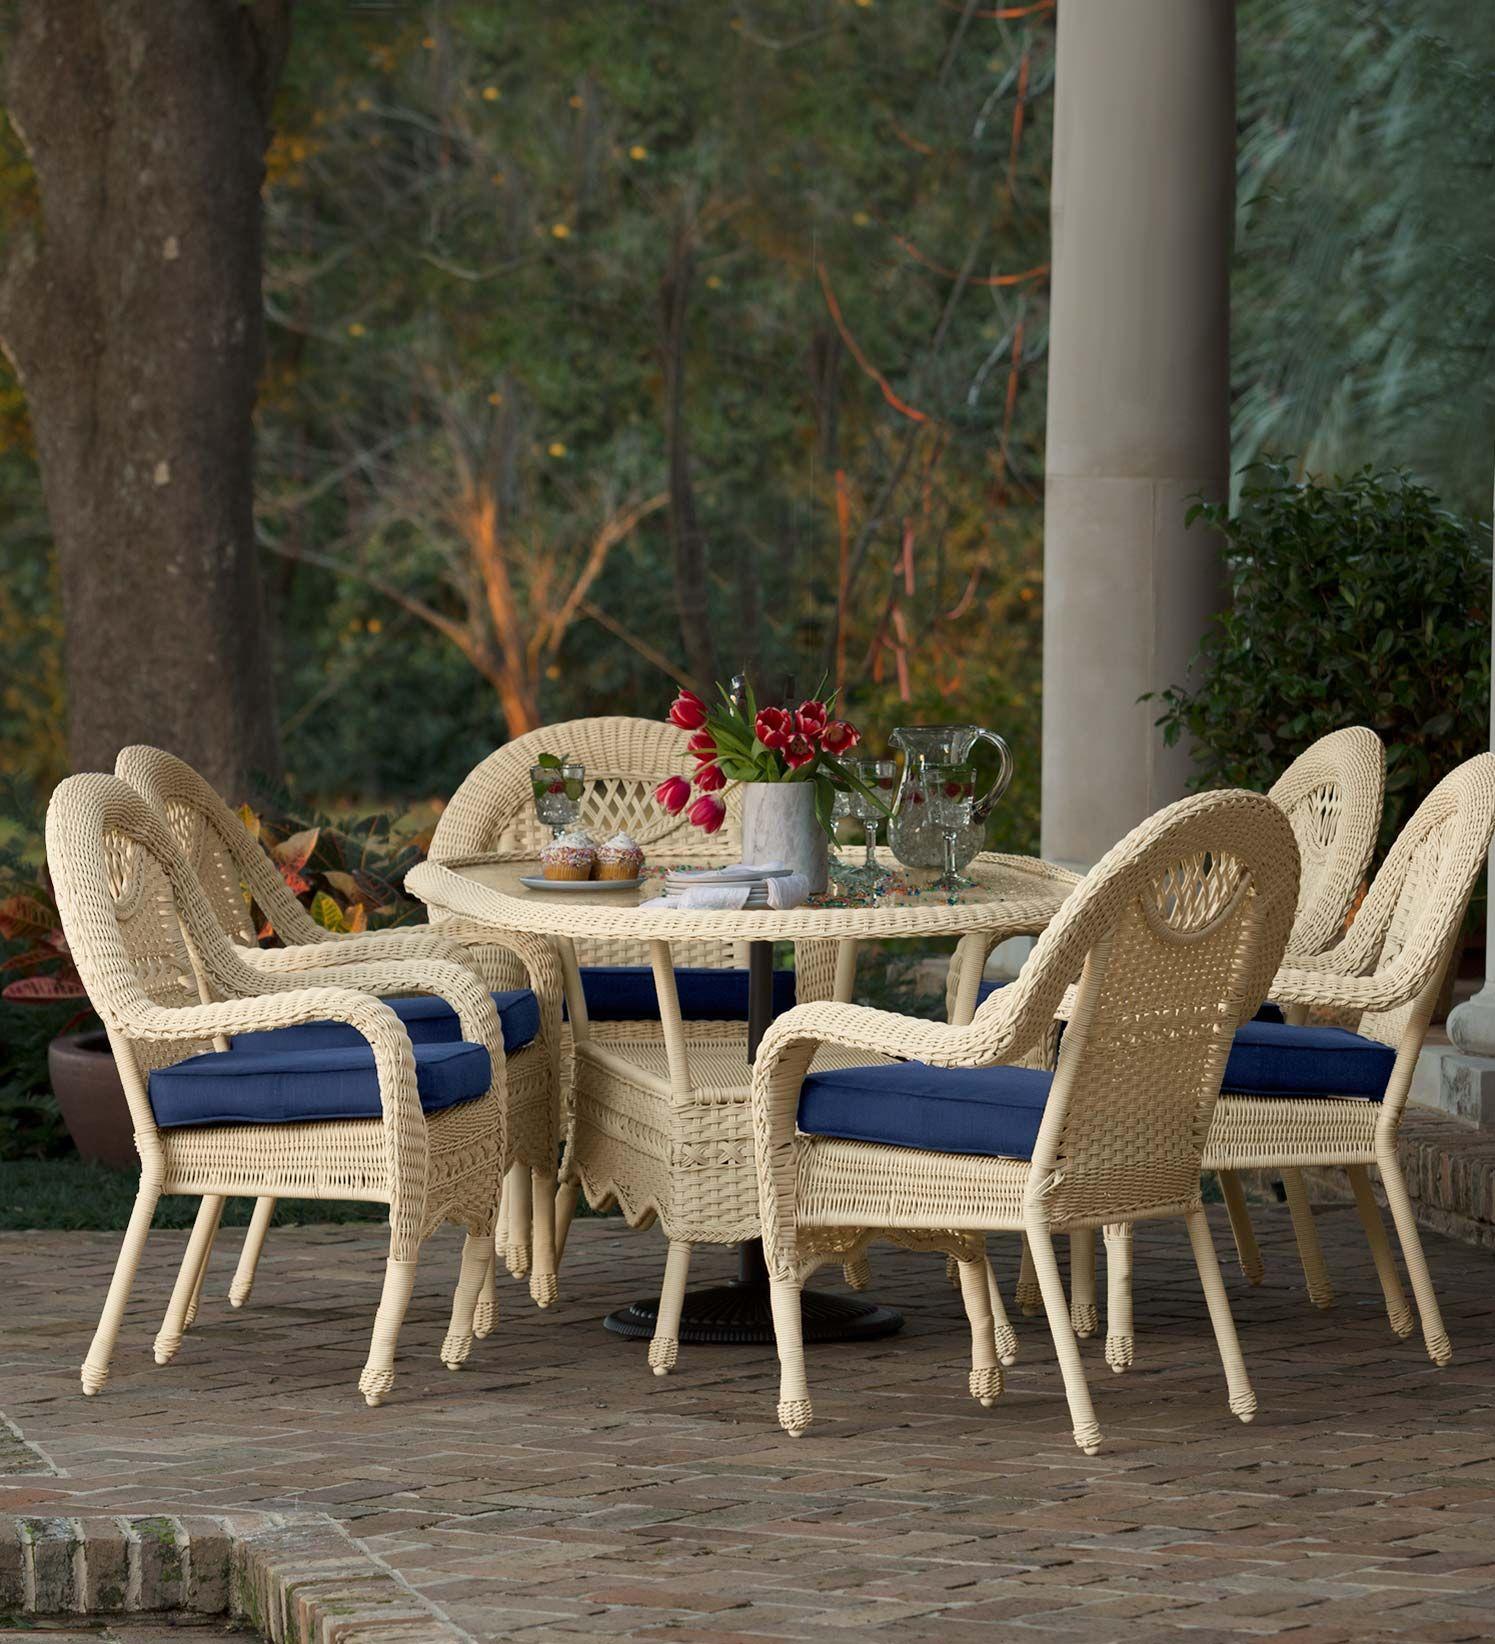 28+ White wicker outdoor dining set ideas in 2021